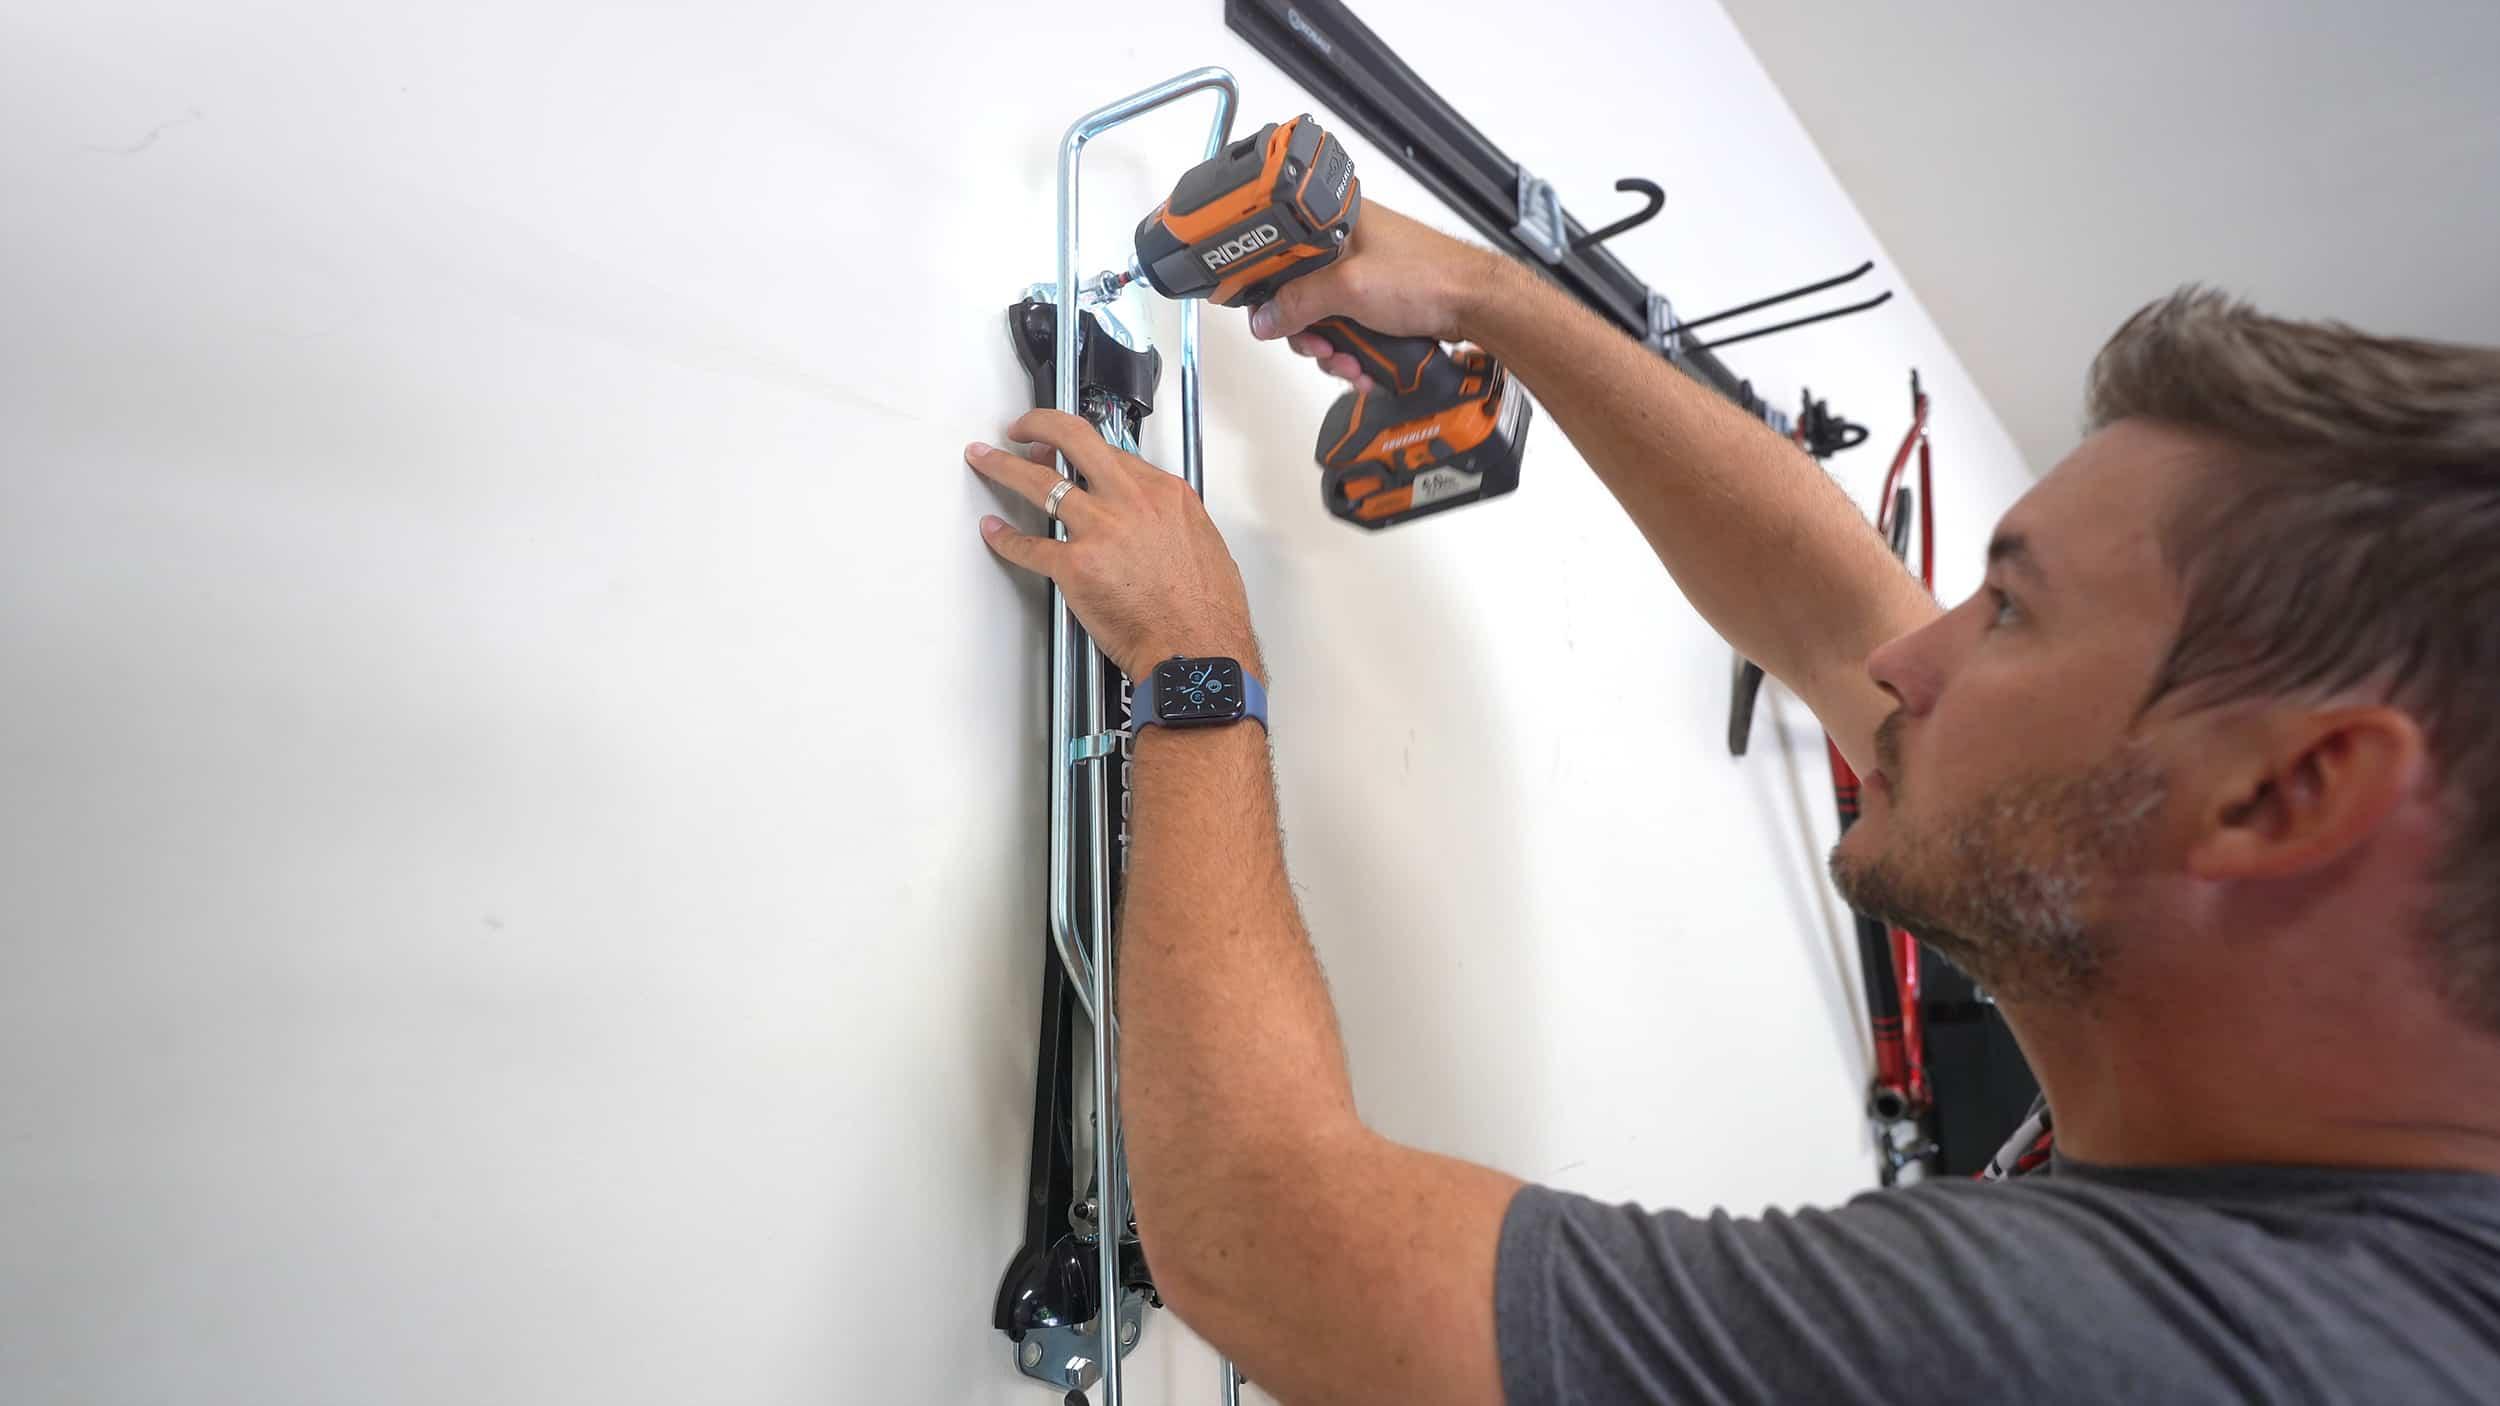 Steadyrack Installation Instructions